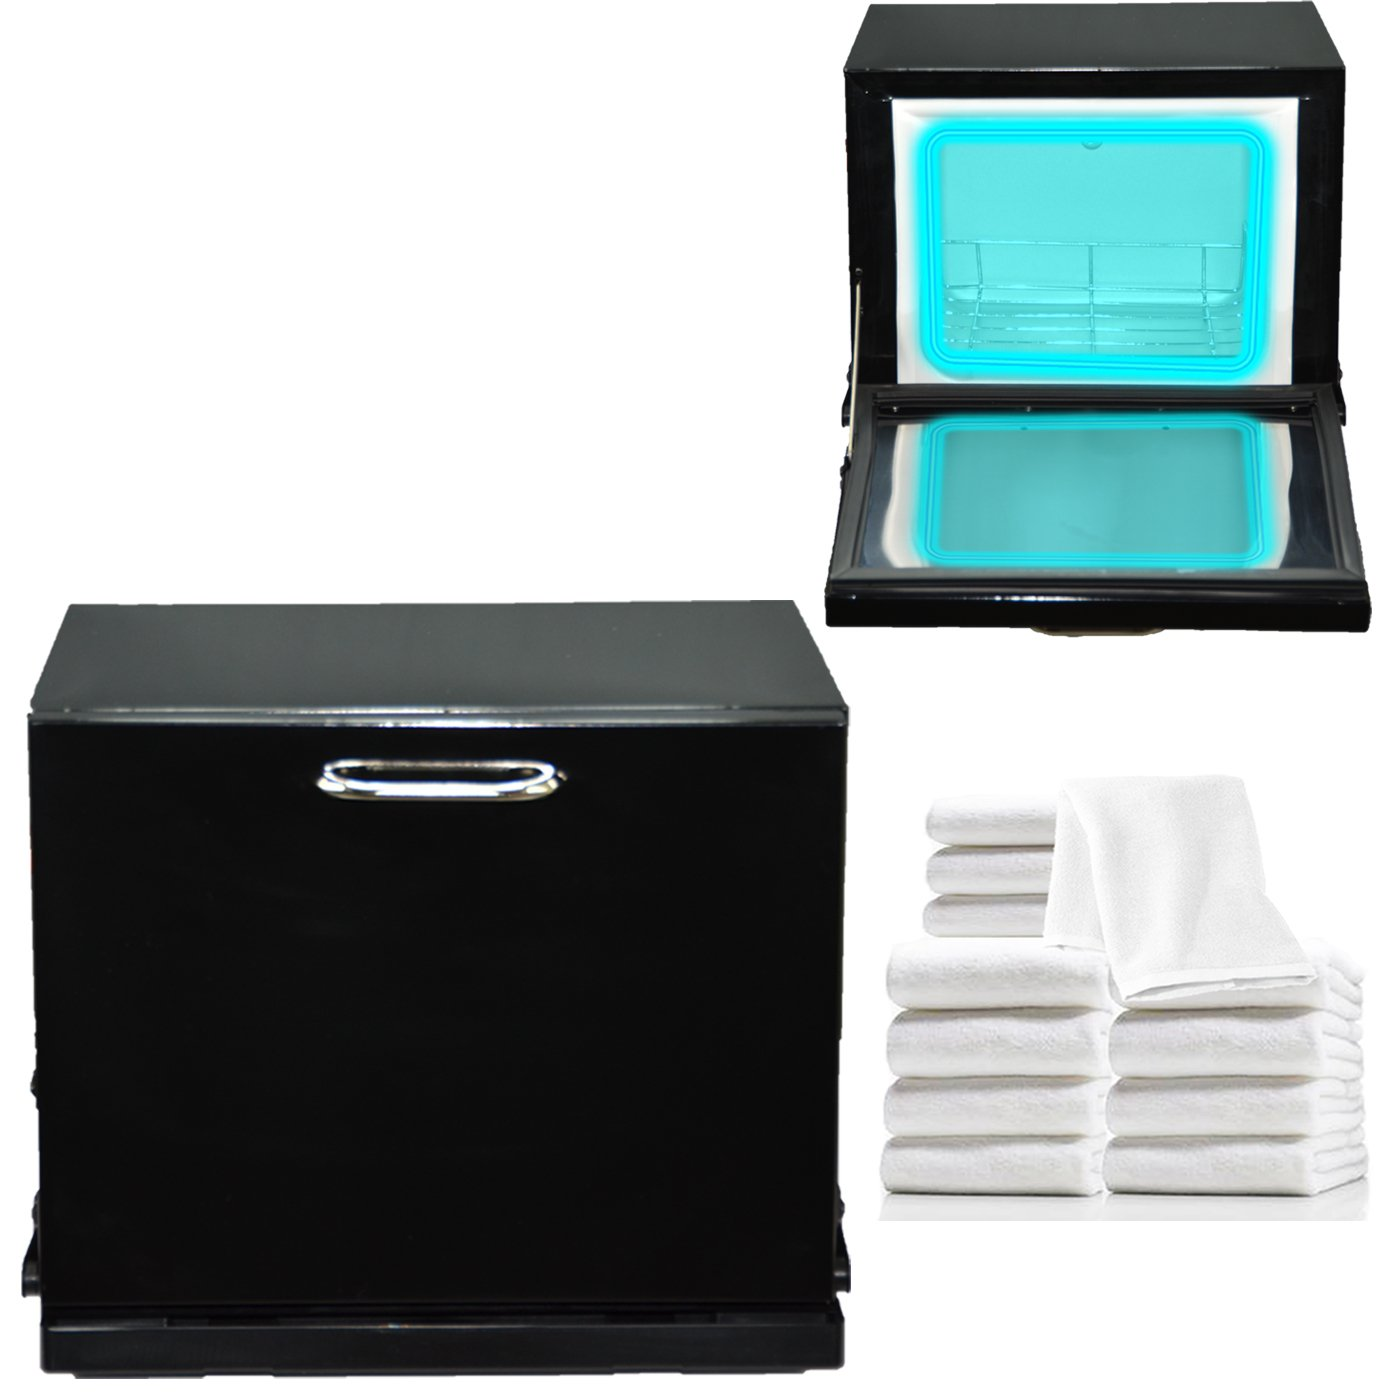 LCL Beauty Black Compact 2-in-1 Towel Warmer & Ultraviolet Sterilizer Cabinet (w/Towels)